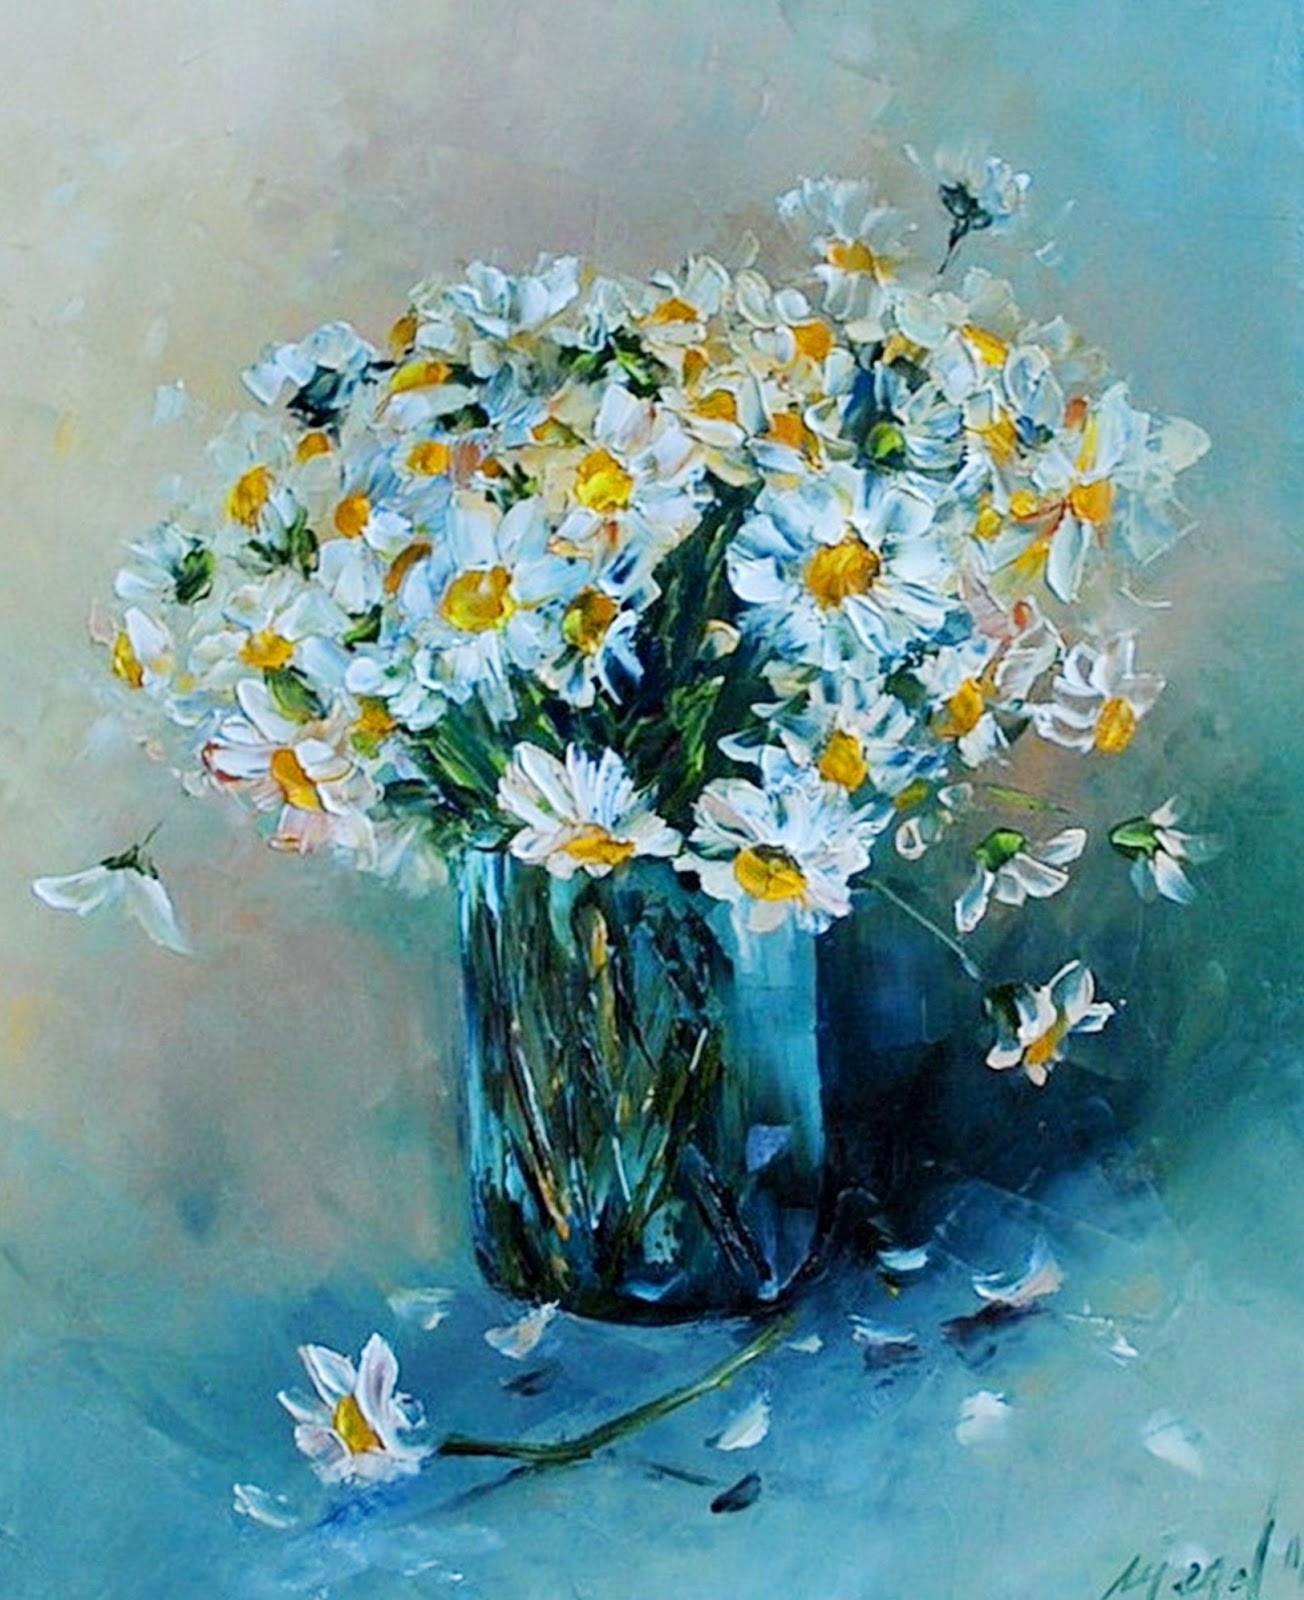 Cuadros pinturas oleos pintura moderna al leo flores - Cuadros flores modernas ...